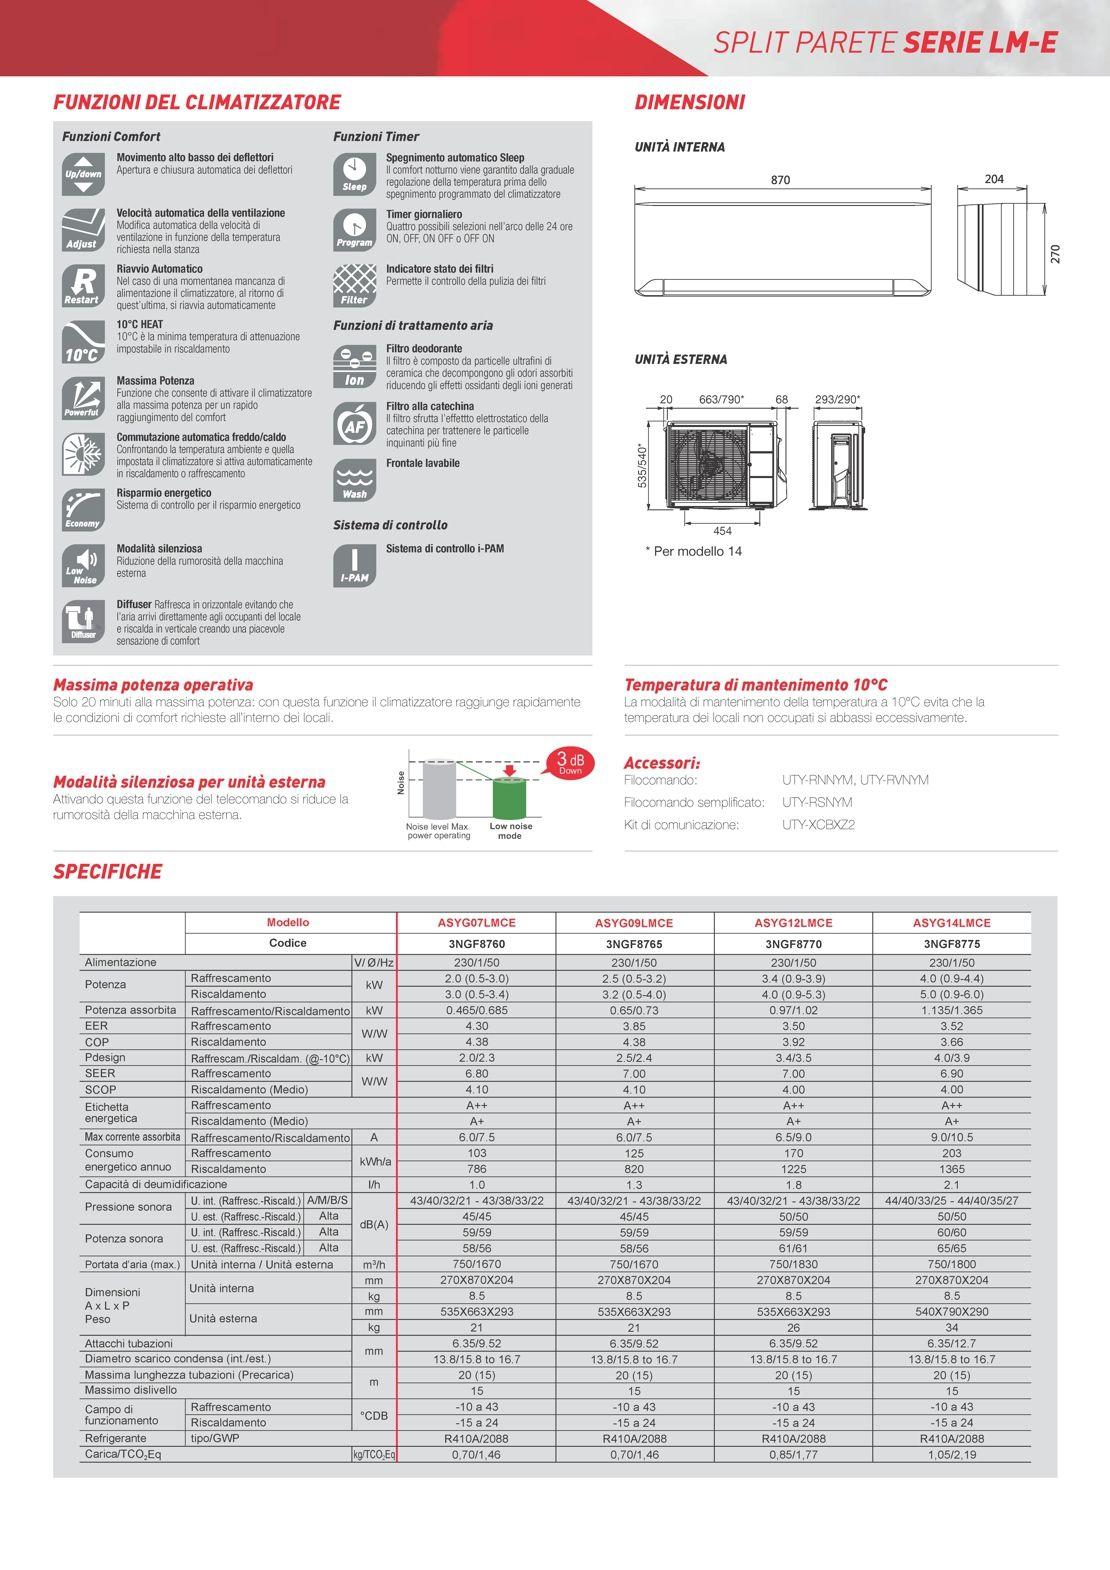 asyg-lmce_climadiqualita_002-compressor.jpg